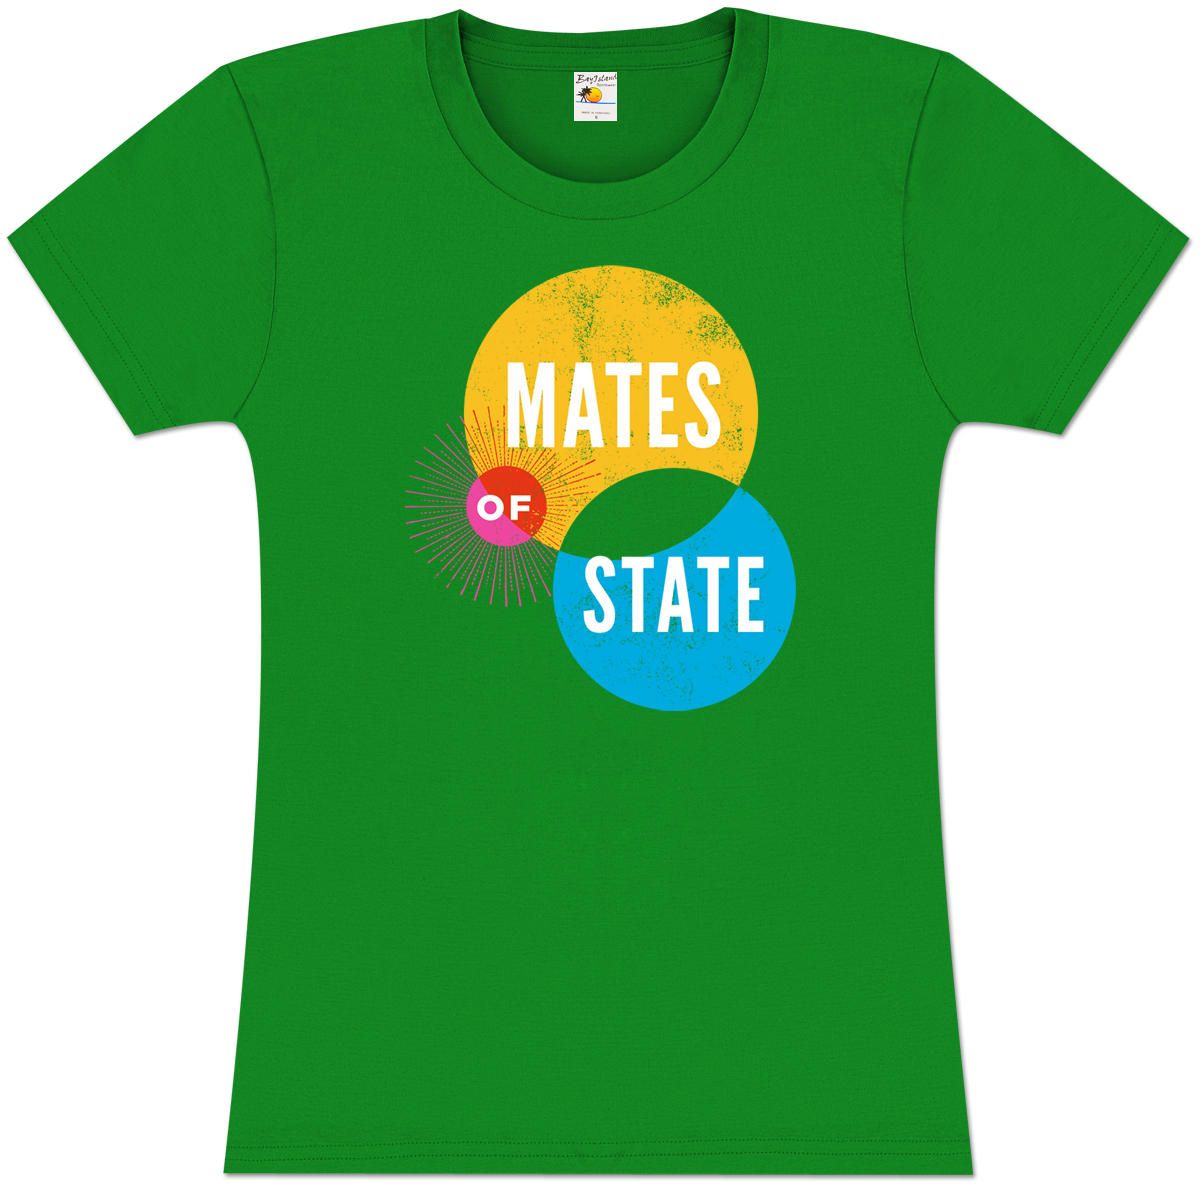 Mates of State Women's Circles T-Shirt